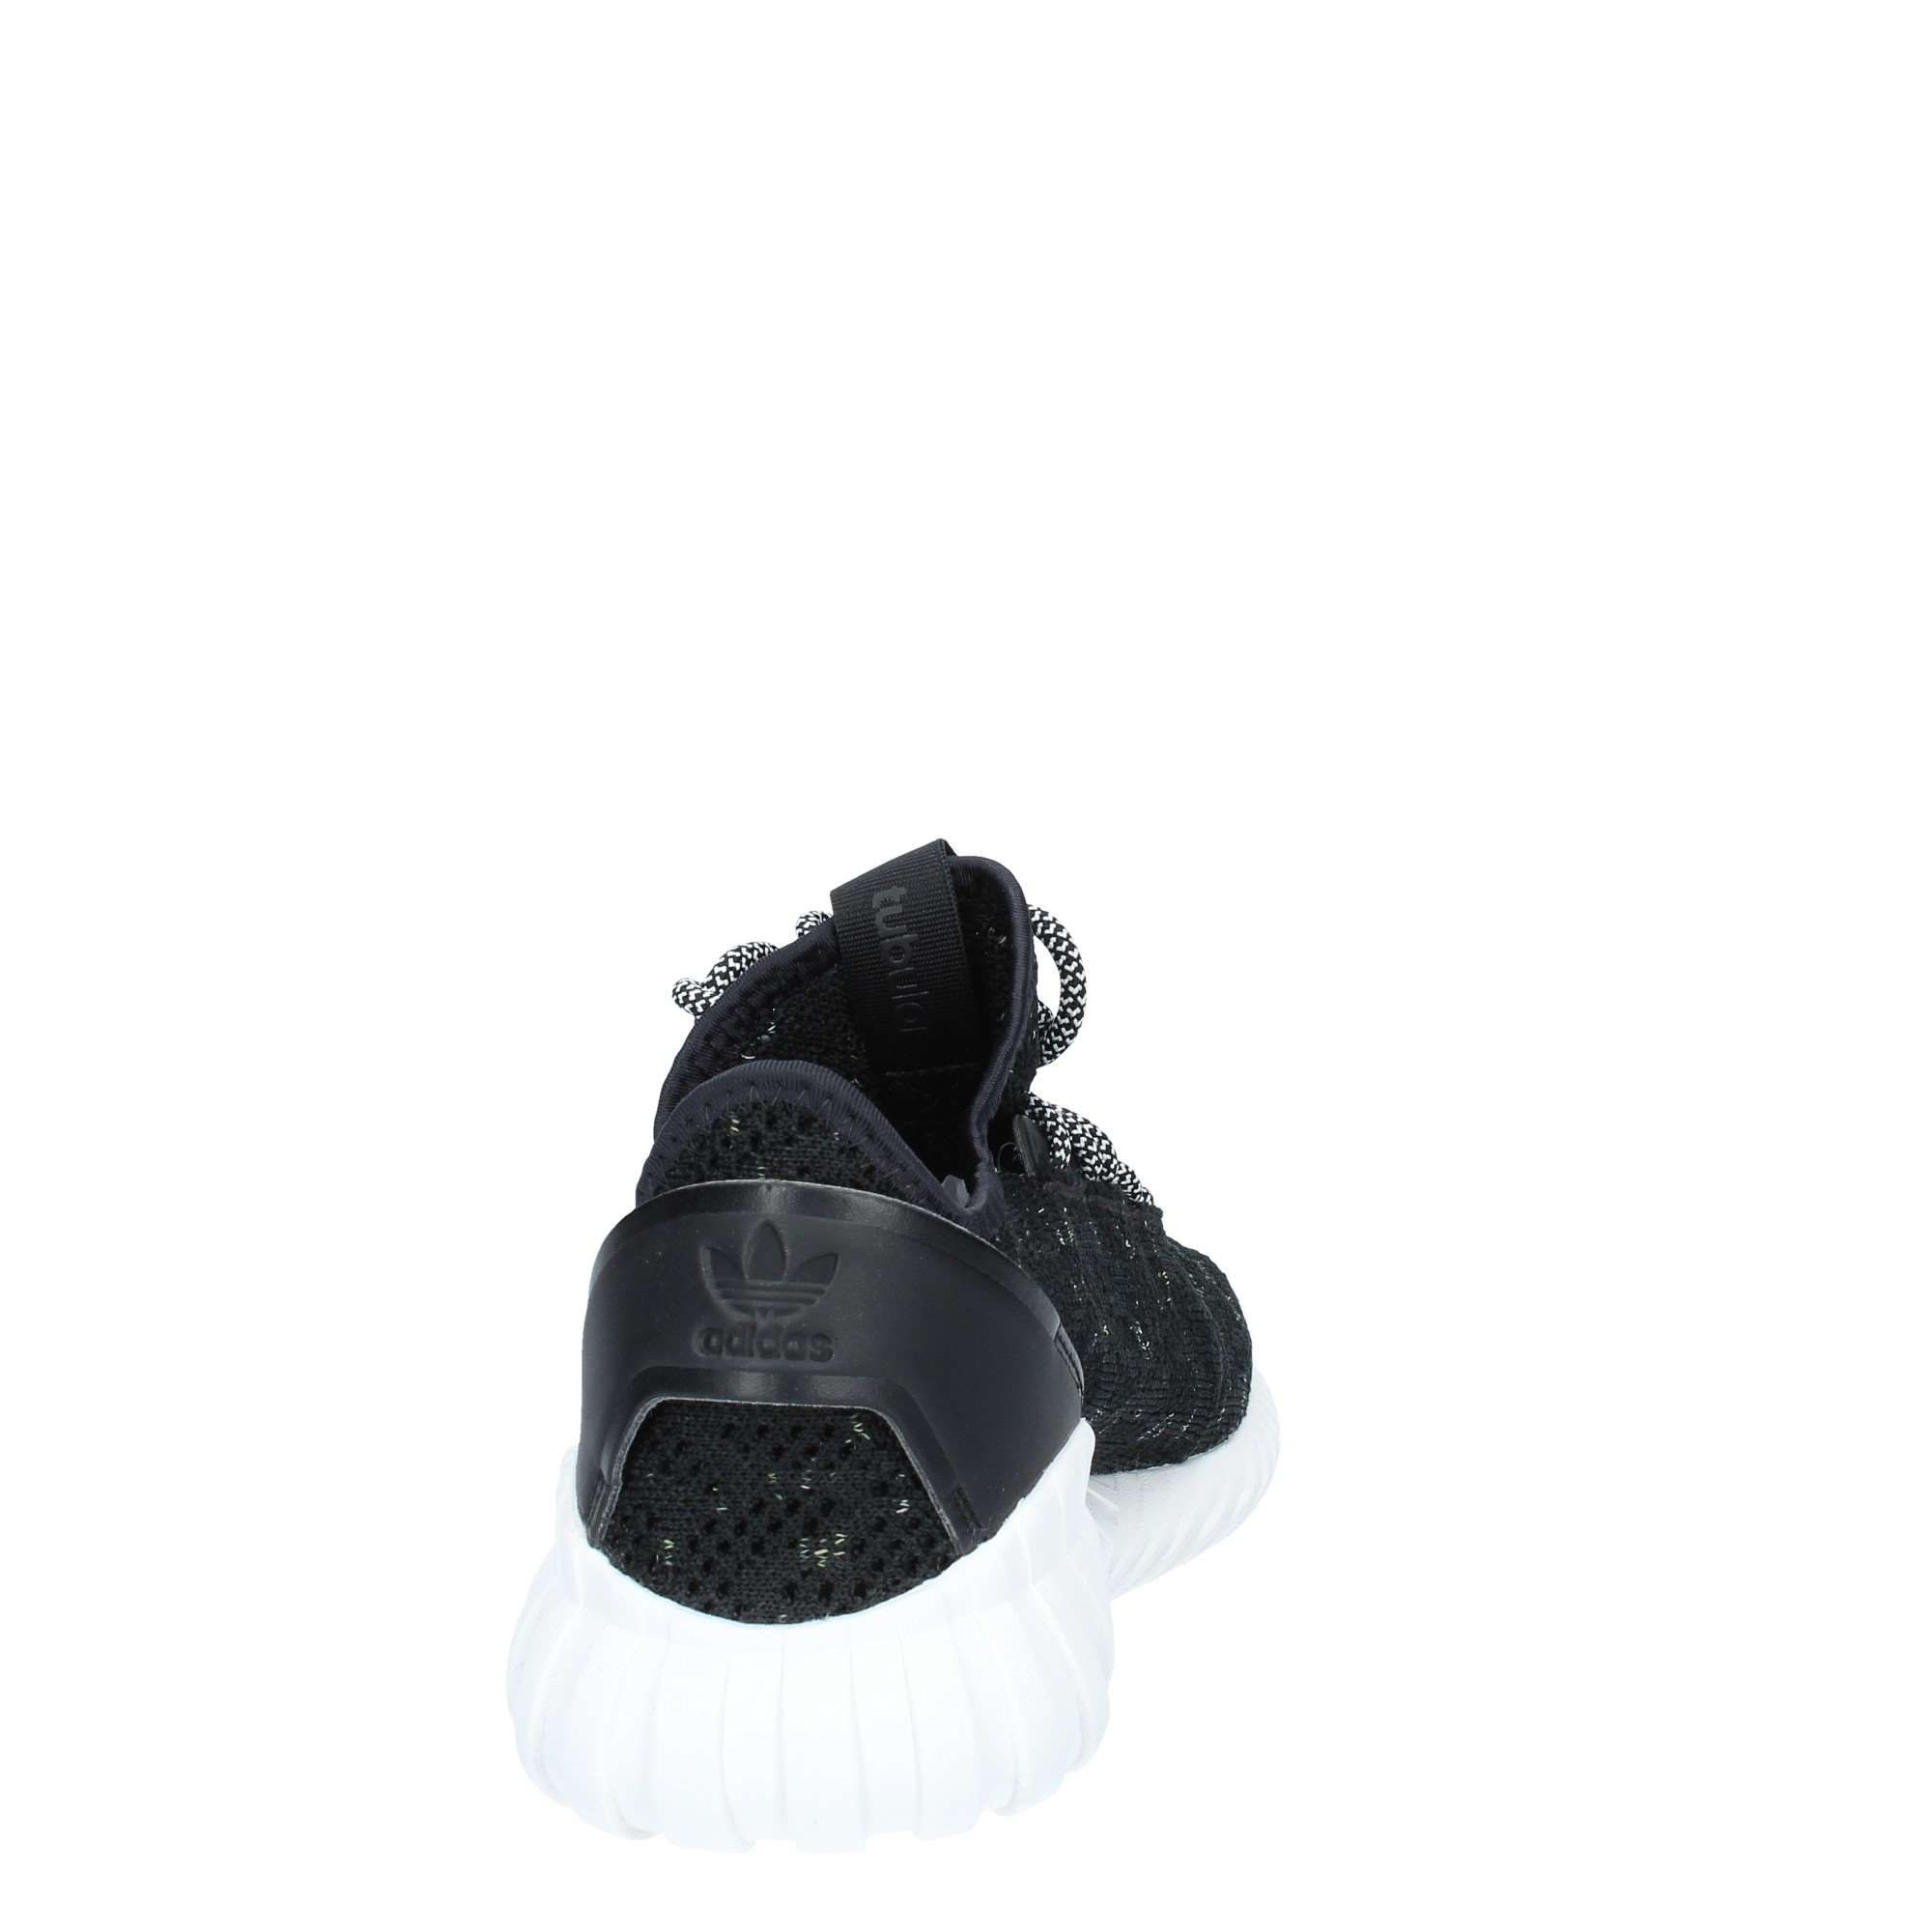 new arrival 64b31 a30e5 Adidas Tubular Doom Sock PK Scarpe da Fitness Uomo Nero (p8n ...